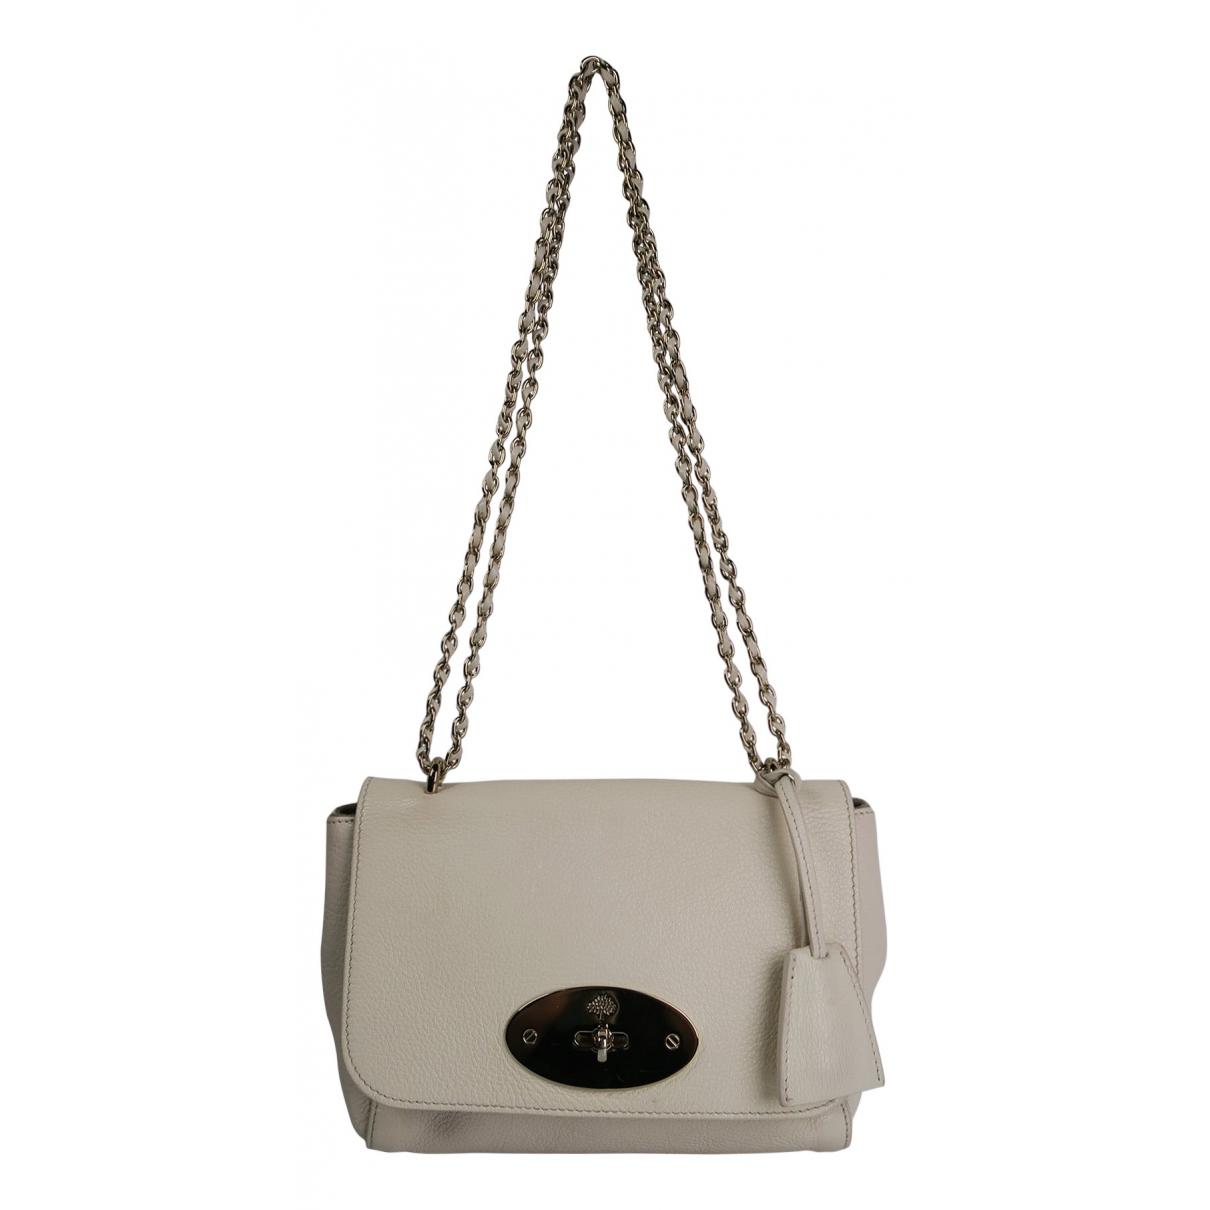 Mulberry N Beige Leather handbag for Women N